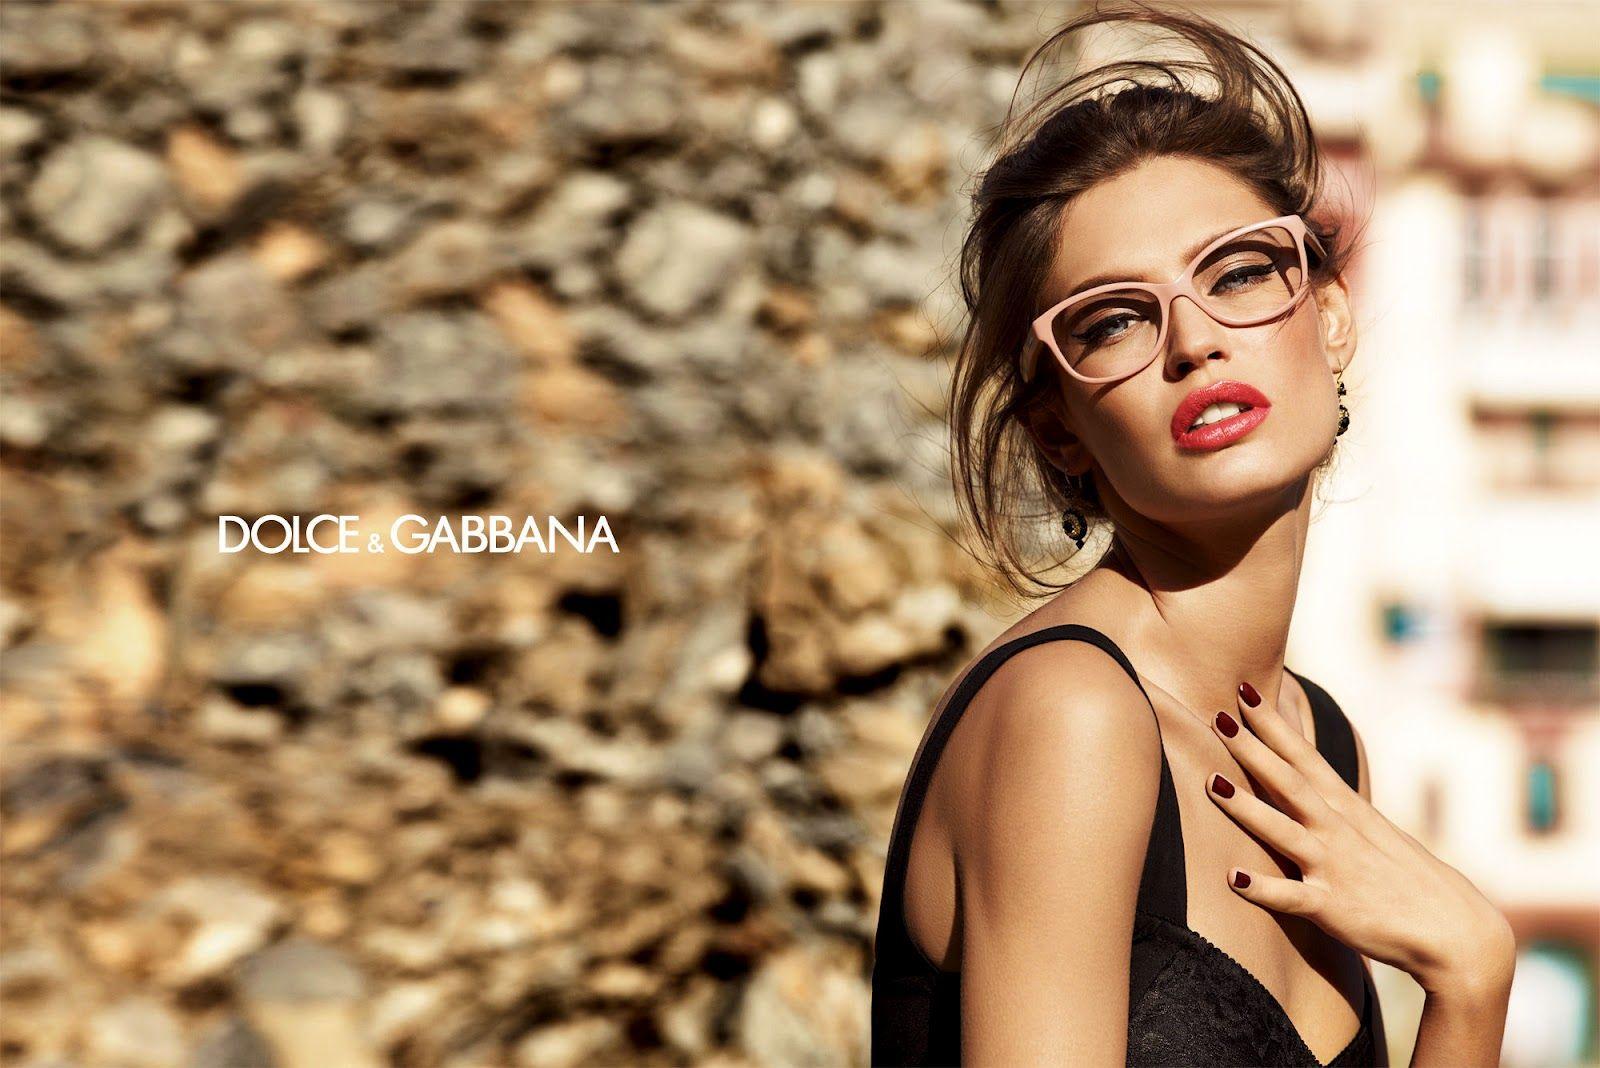 Bianca Balti for Dolce & Gabbana Eyewear | Bianca balti, Eyewear and ...